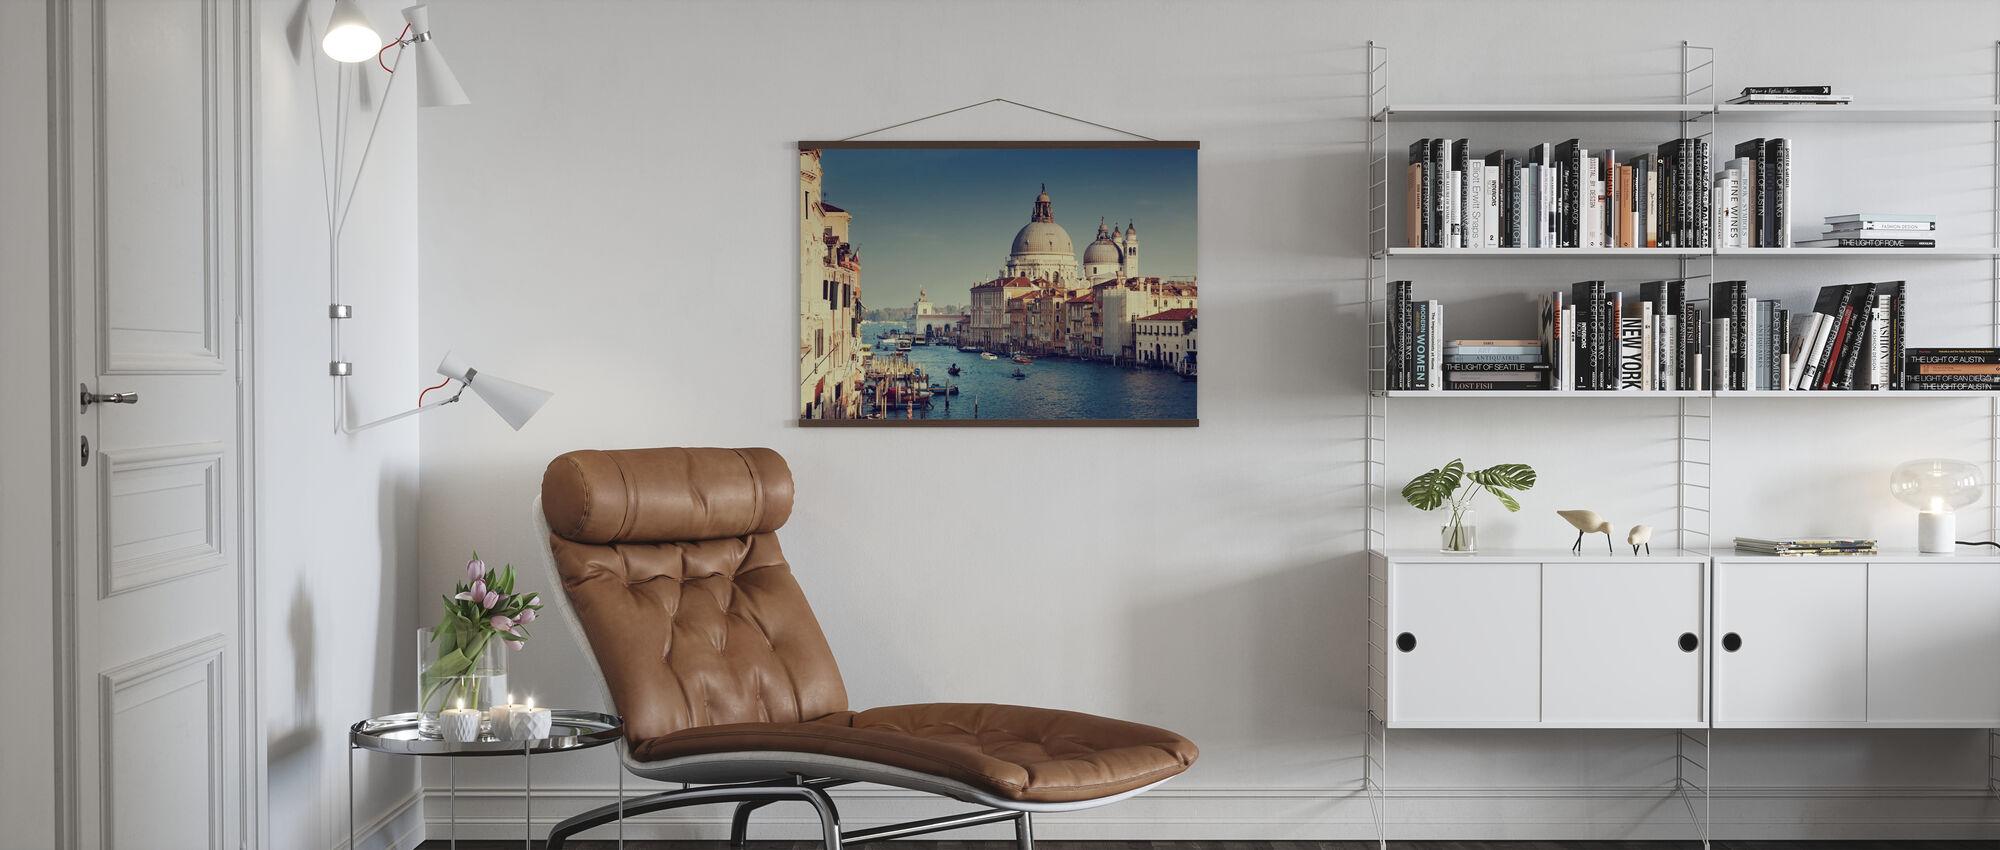 Grand Canal i Venedig - Plakat - Stue